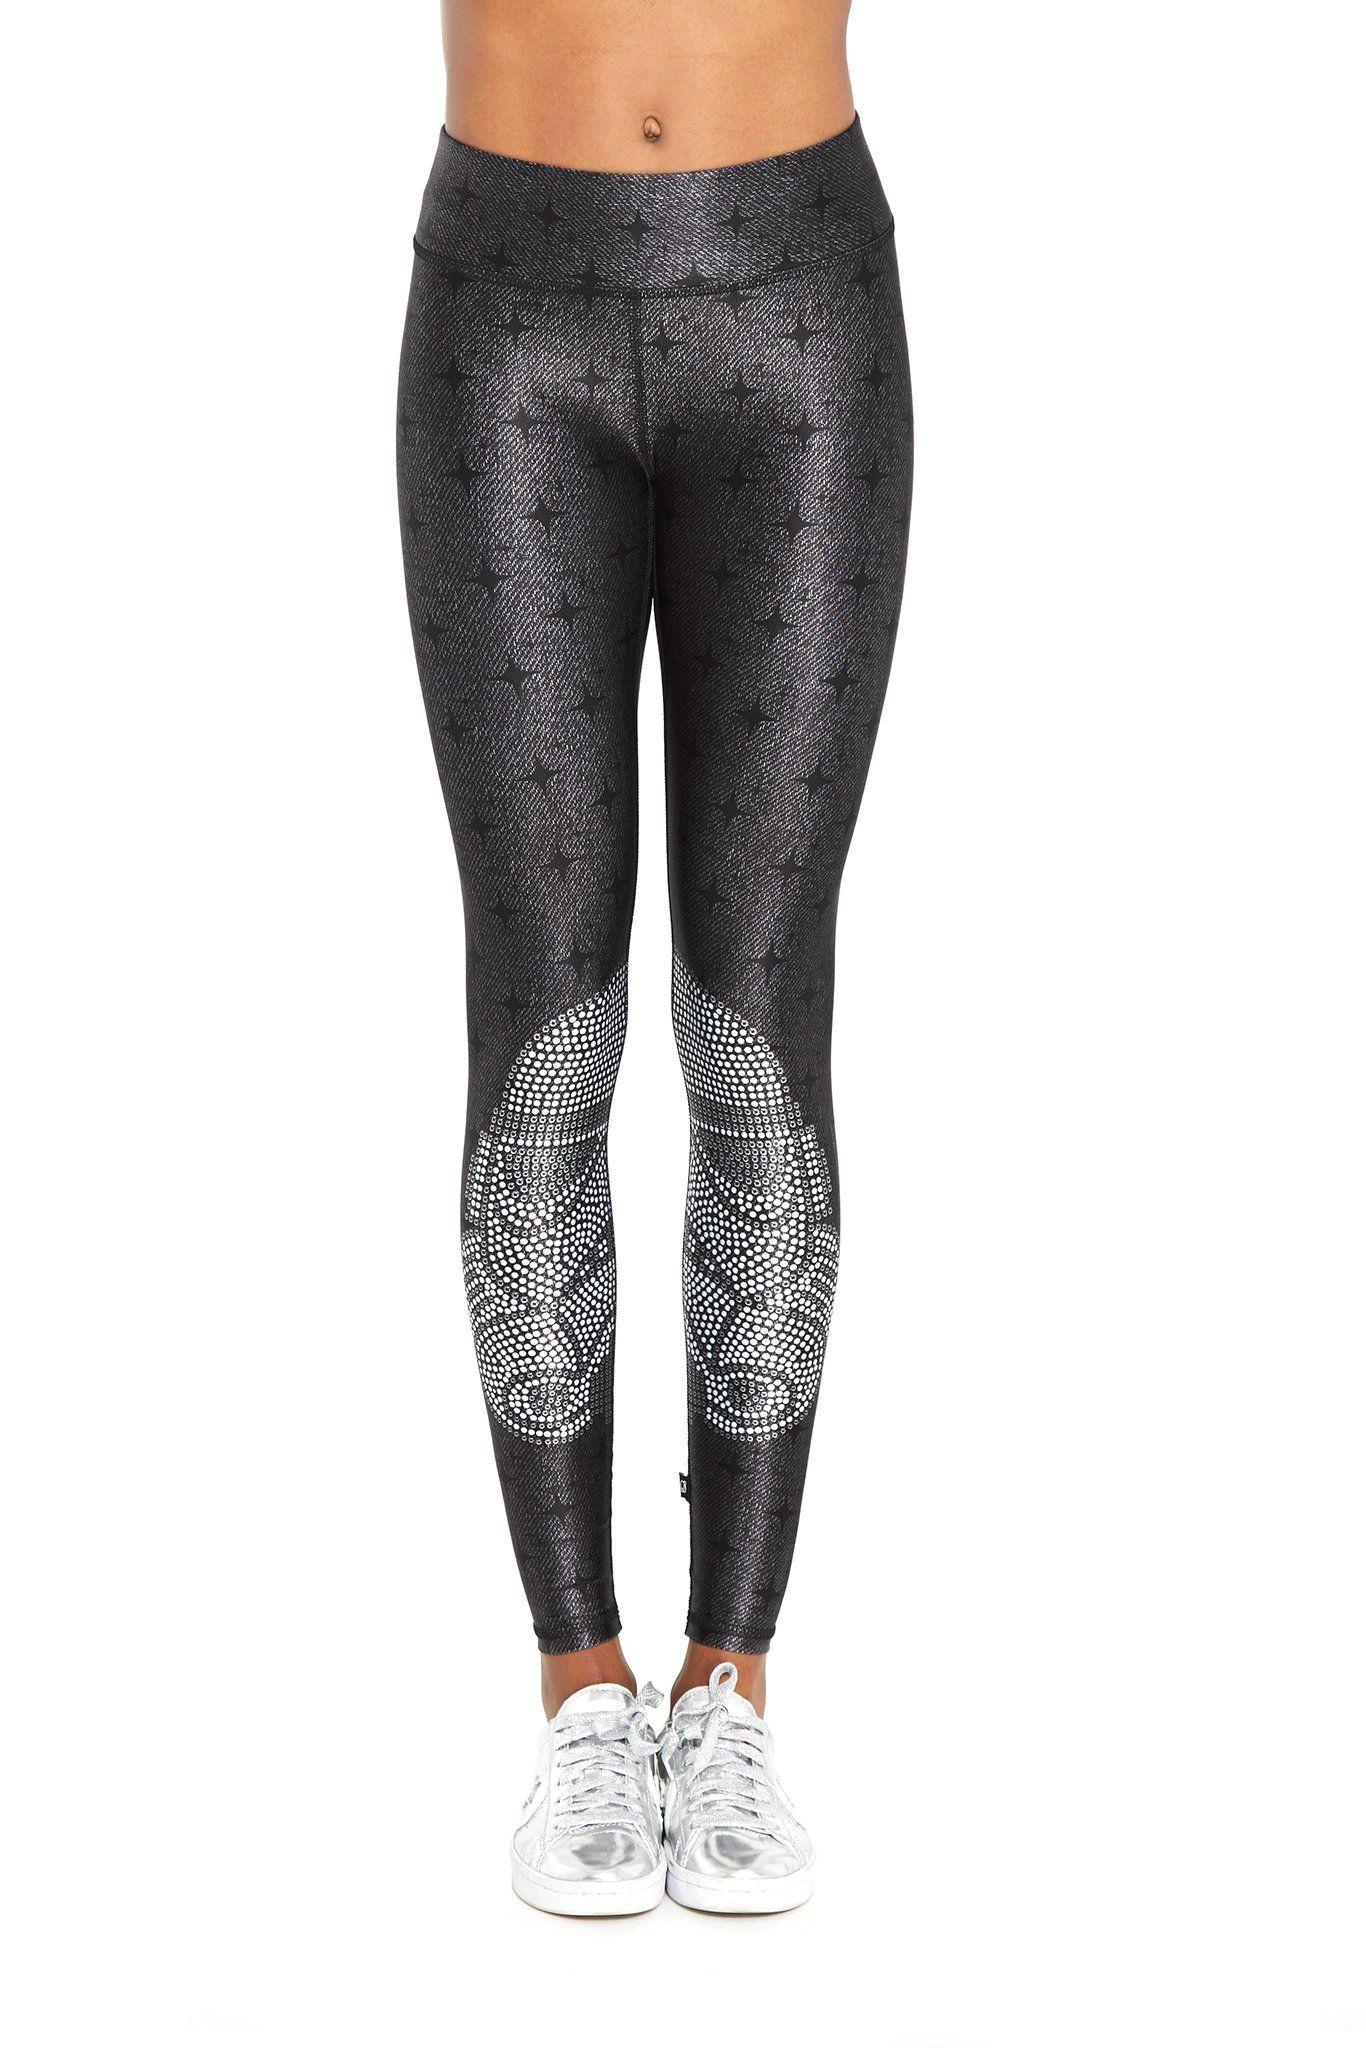 fb6945e42bcf2 Women's Terez x Star Wars Crystal Trooper Tall Band Leggings ⭐️The Kessel  Runway ⭐ Star Wars fashion ⭐ Geek Fashion ⭐ Star Wars Style ⭐ Geek ...